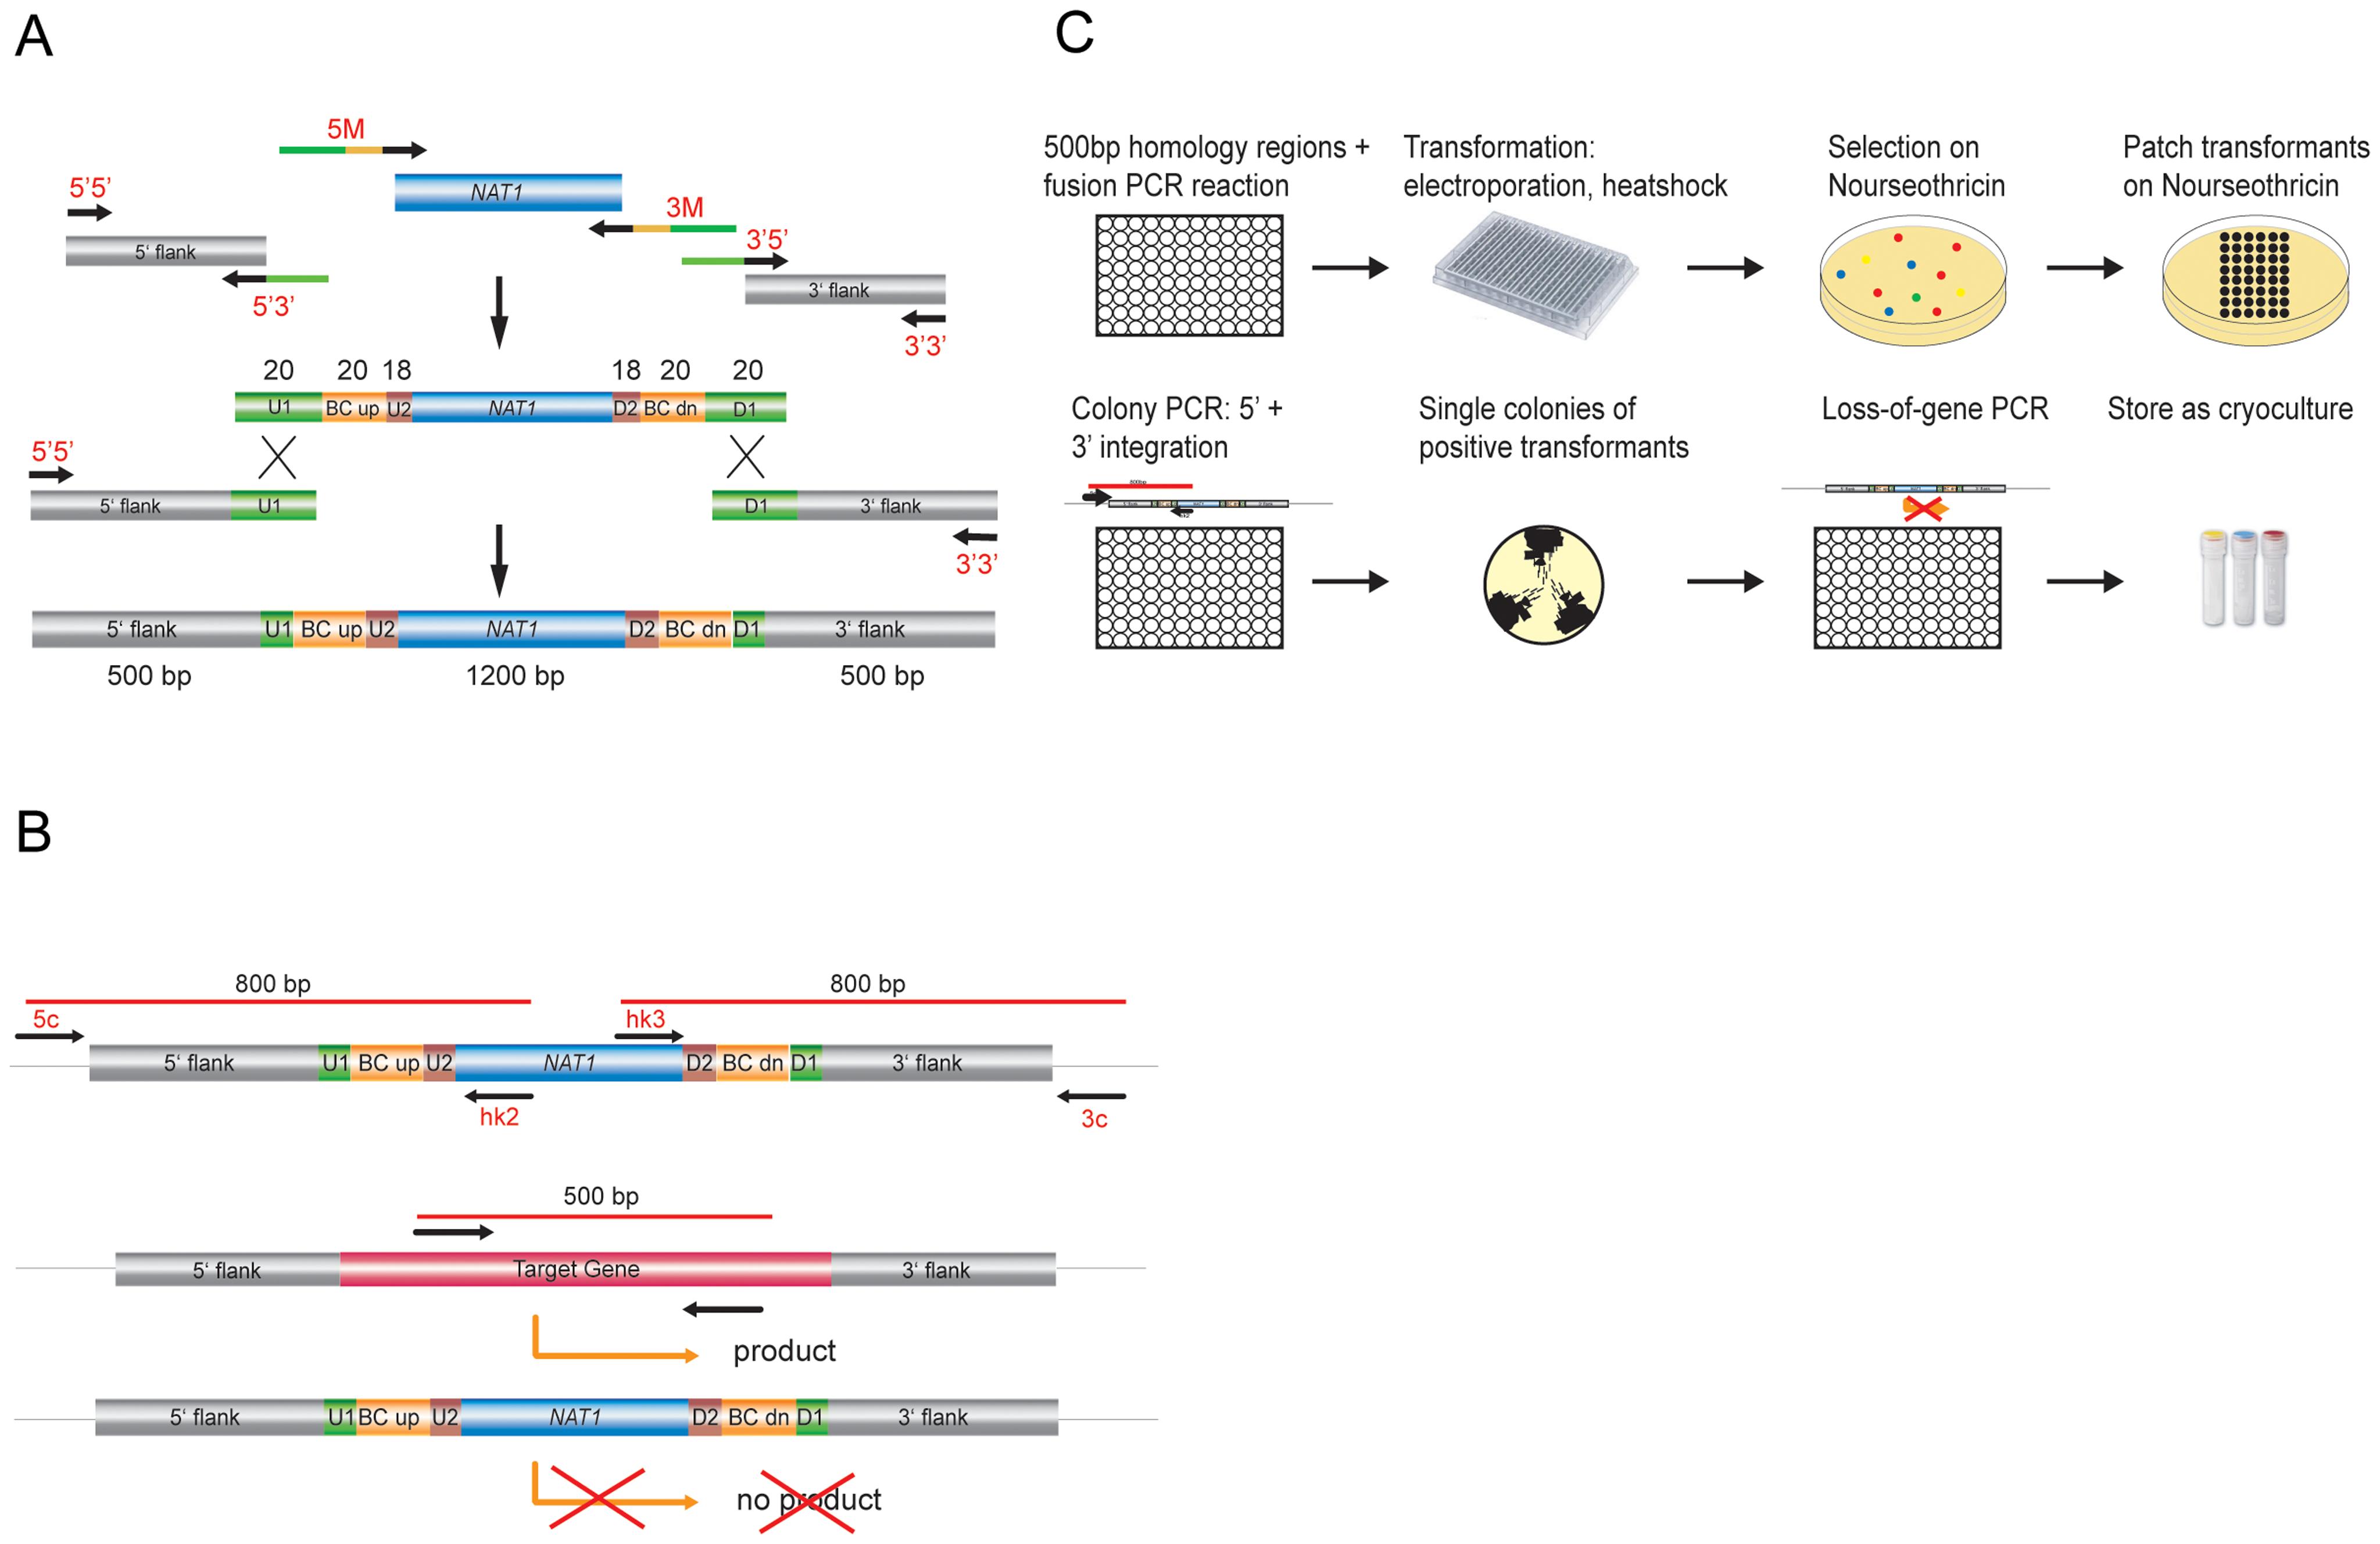 Generation of <i>C. glabrata</i> mutants and systematic phenotypic analysis.